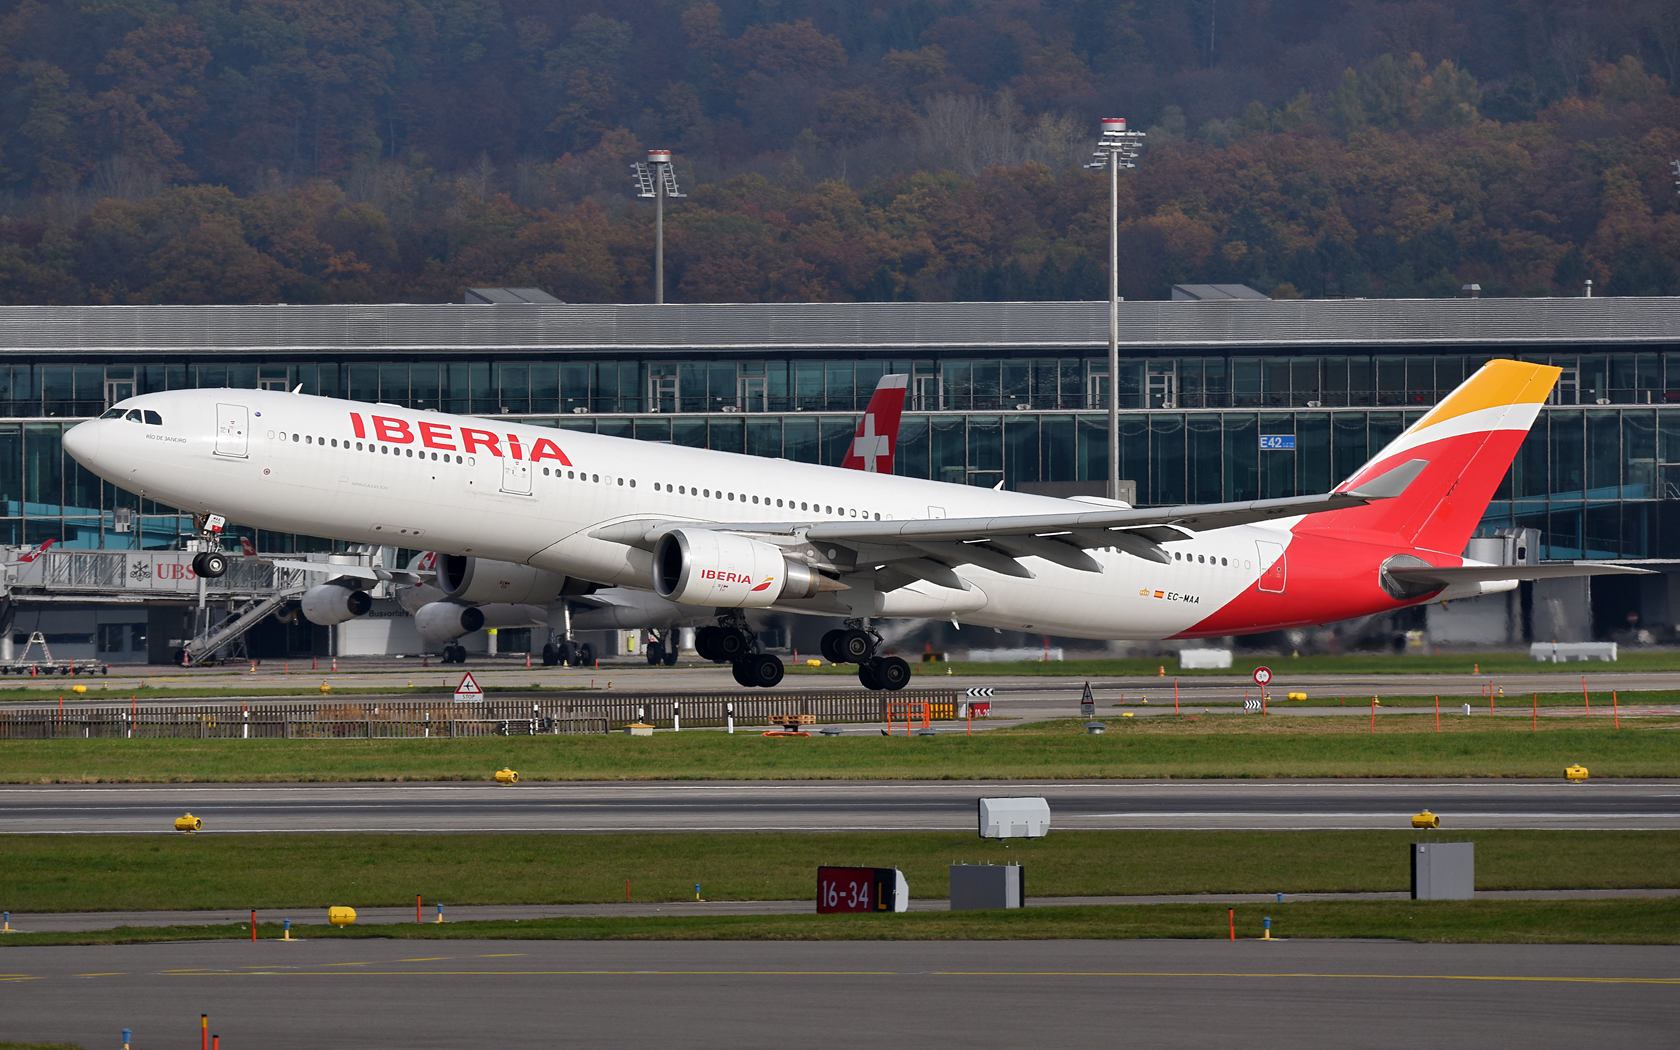 Iberia Airbus A330-300 EC-MAA